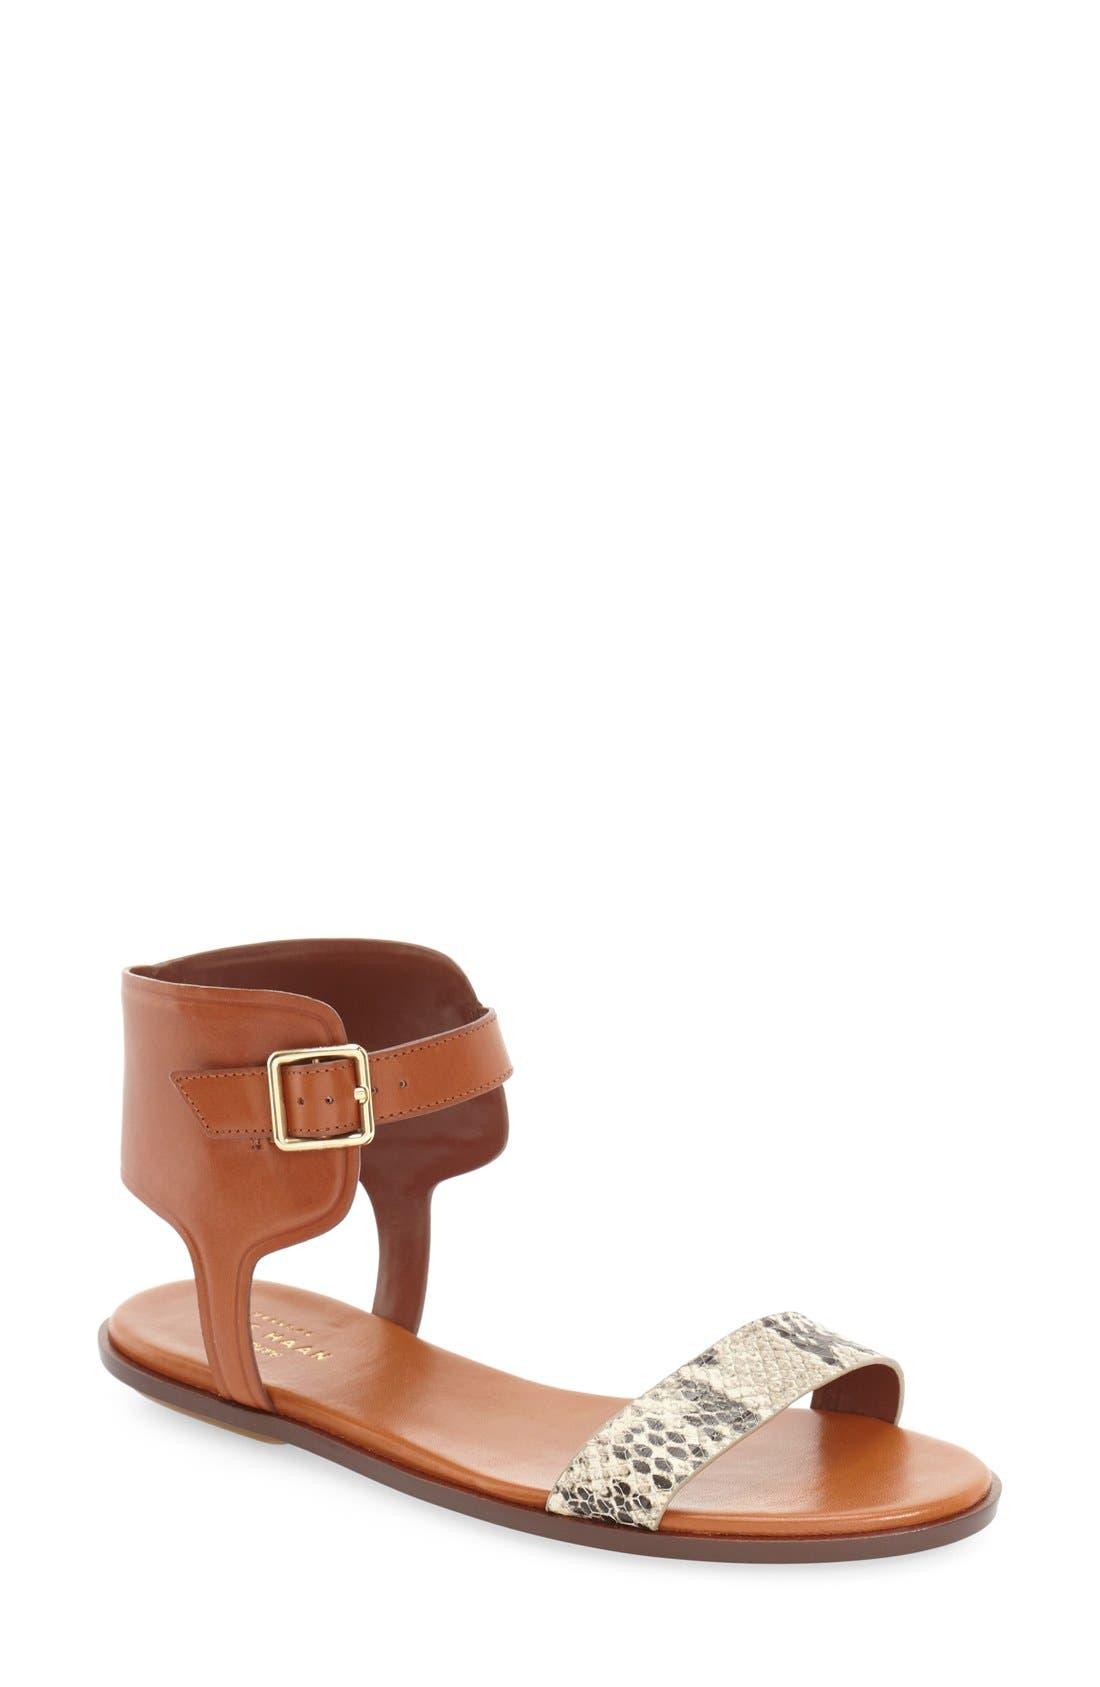 Alternate Image 1 Selected - Cole Haan 'Barra' Flat Sandal (Women)